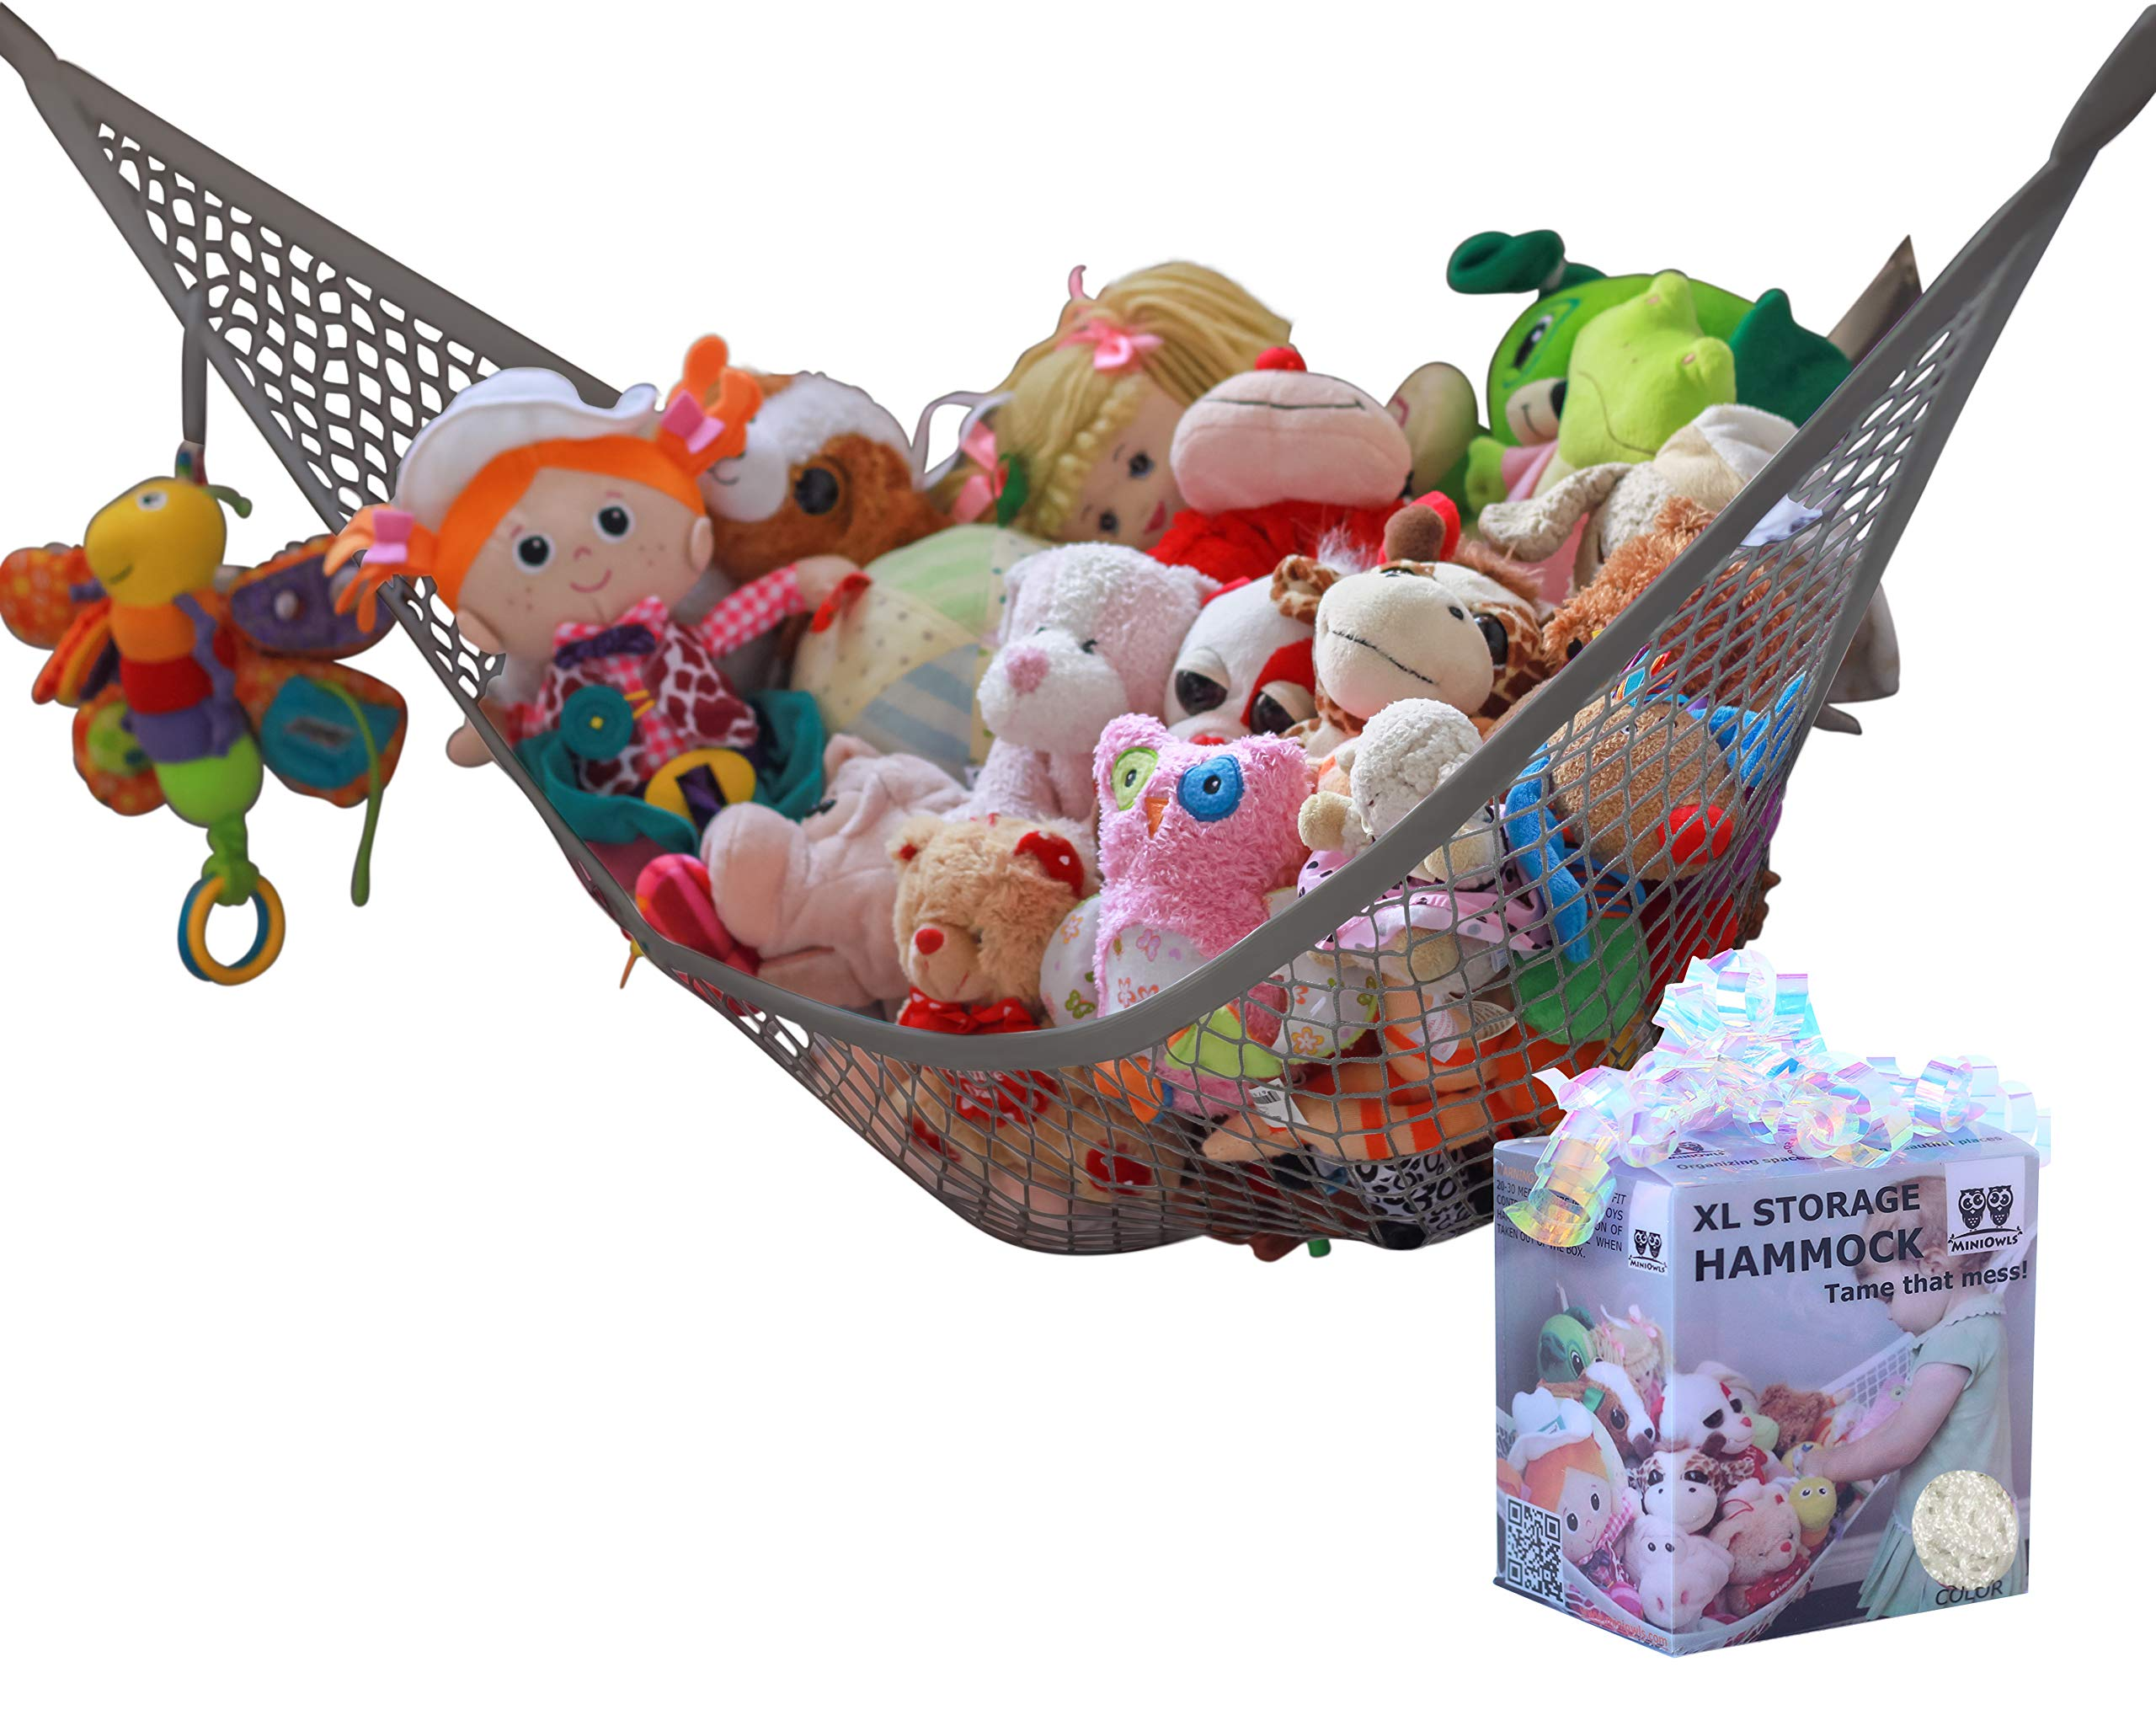 MiniOwls Storage Hammock Stuffed Toy Net (Gray XL) by MiniOwls